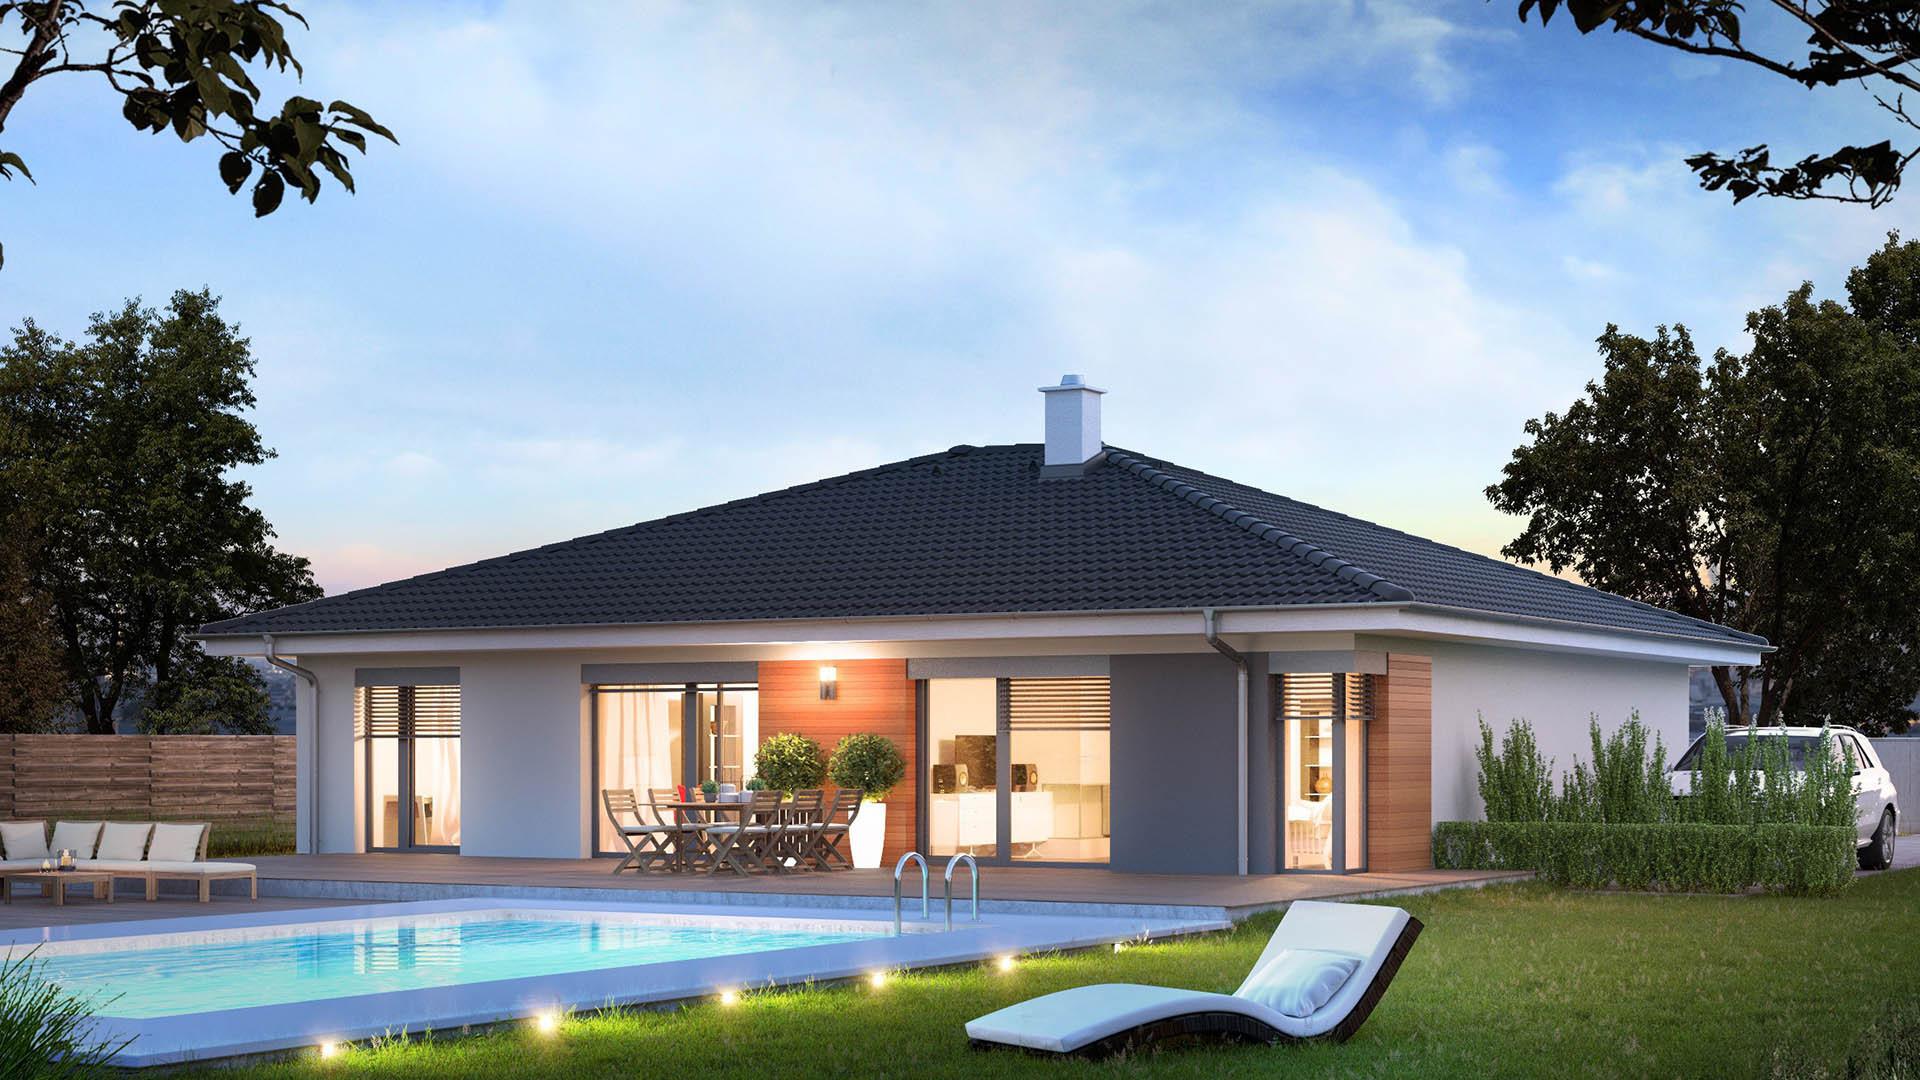 Home Slide 1 – Variant Hause